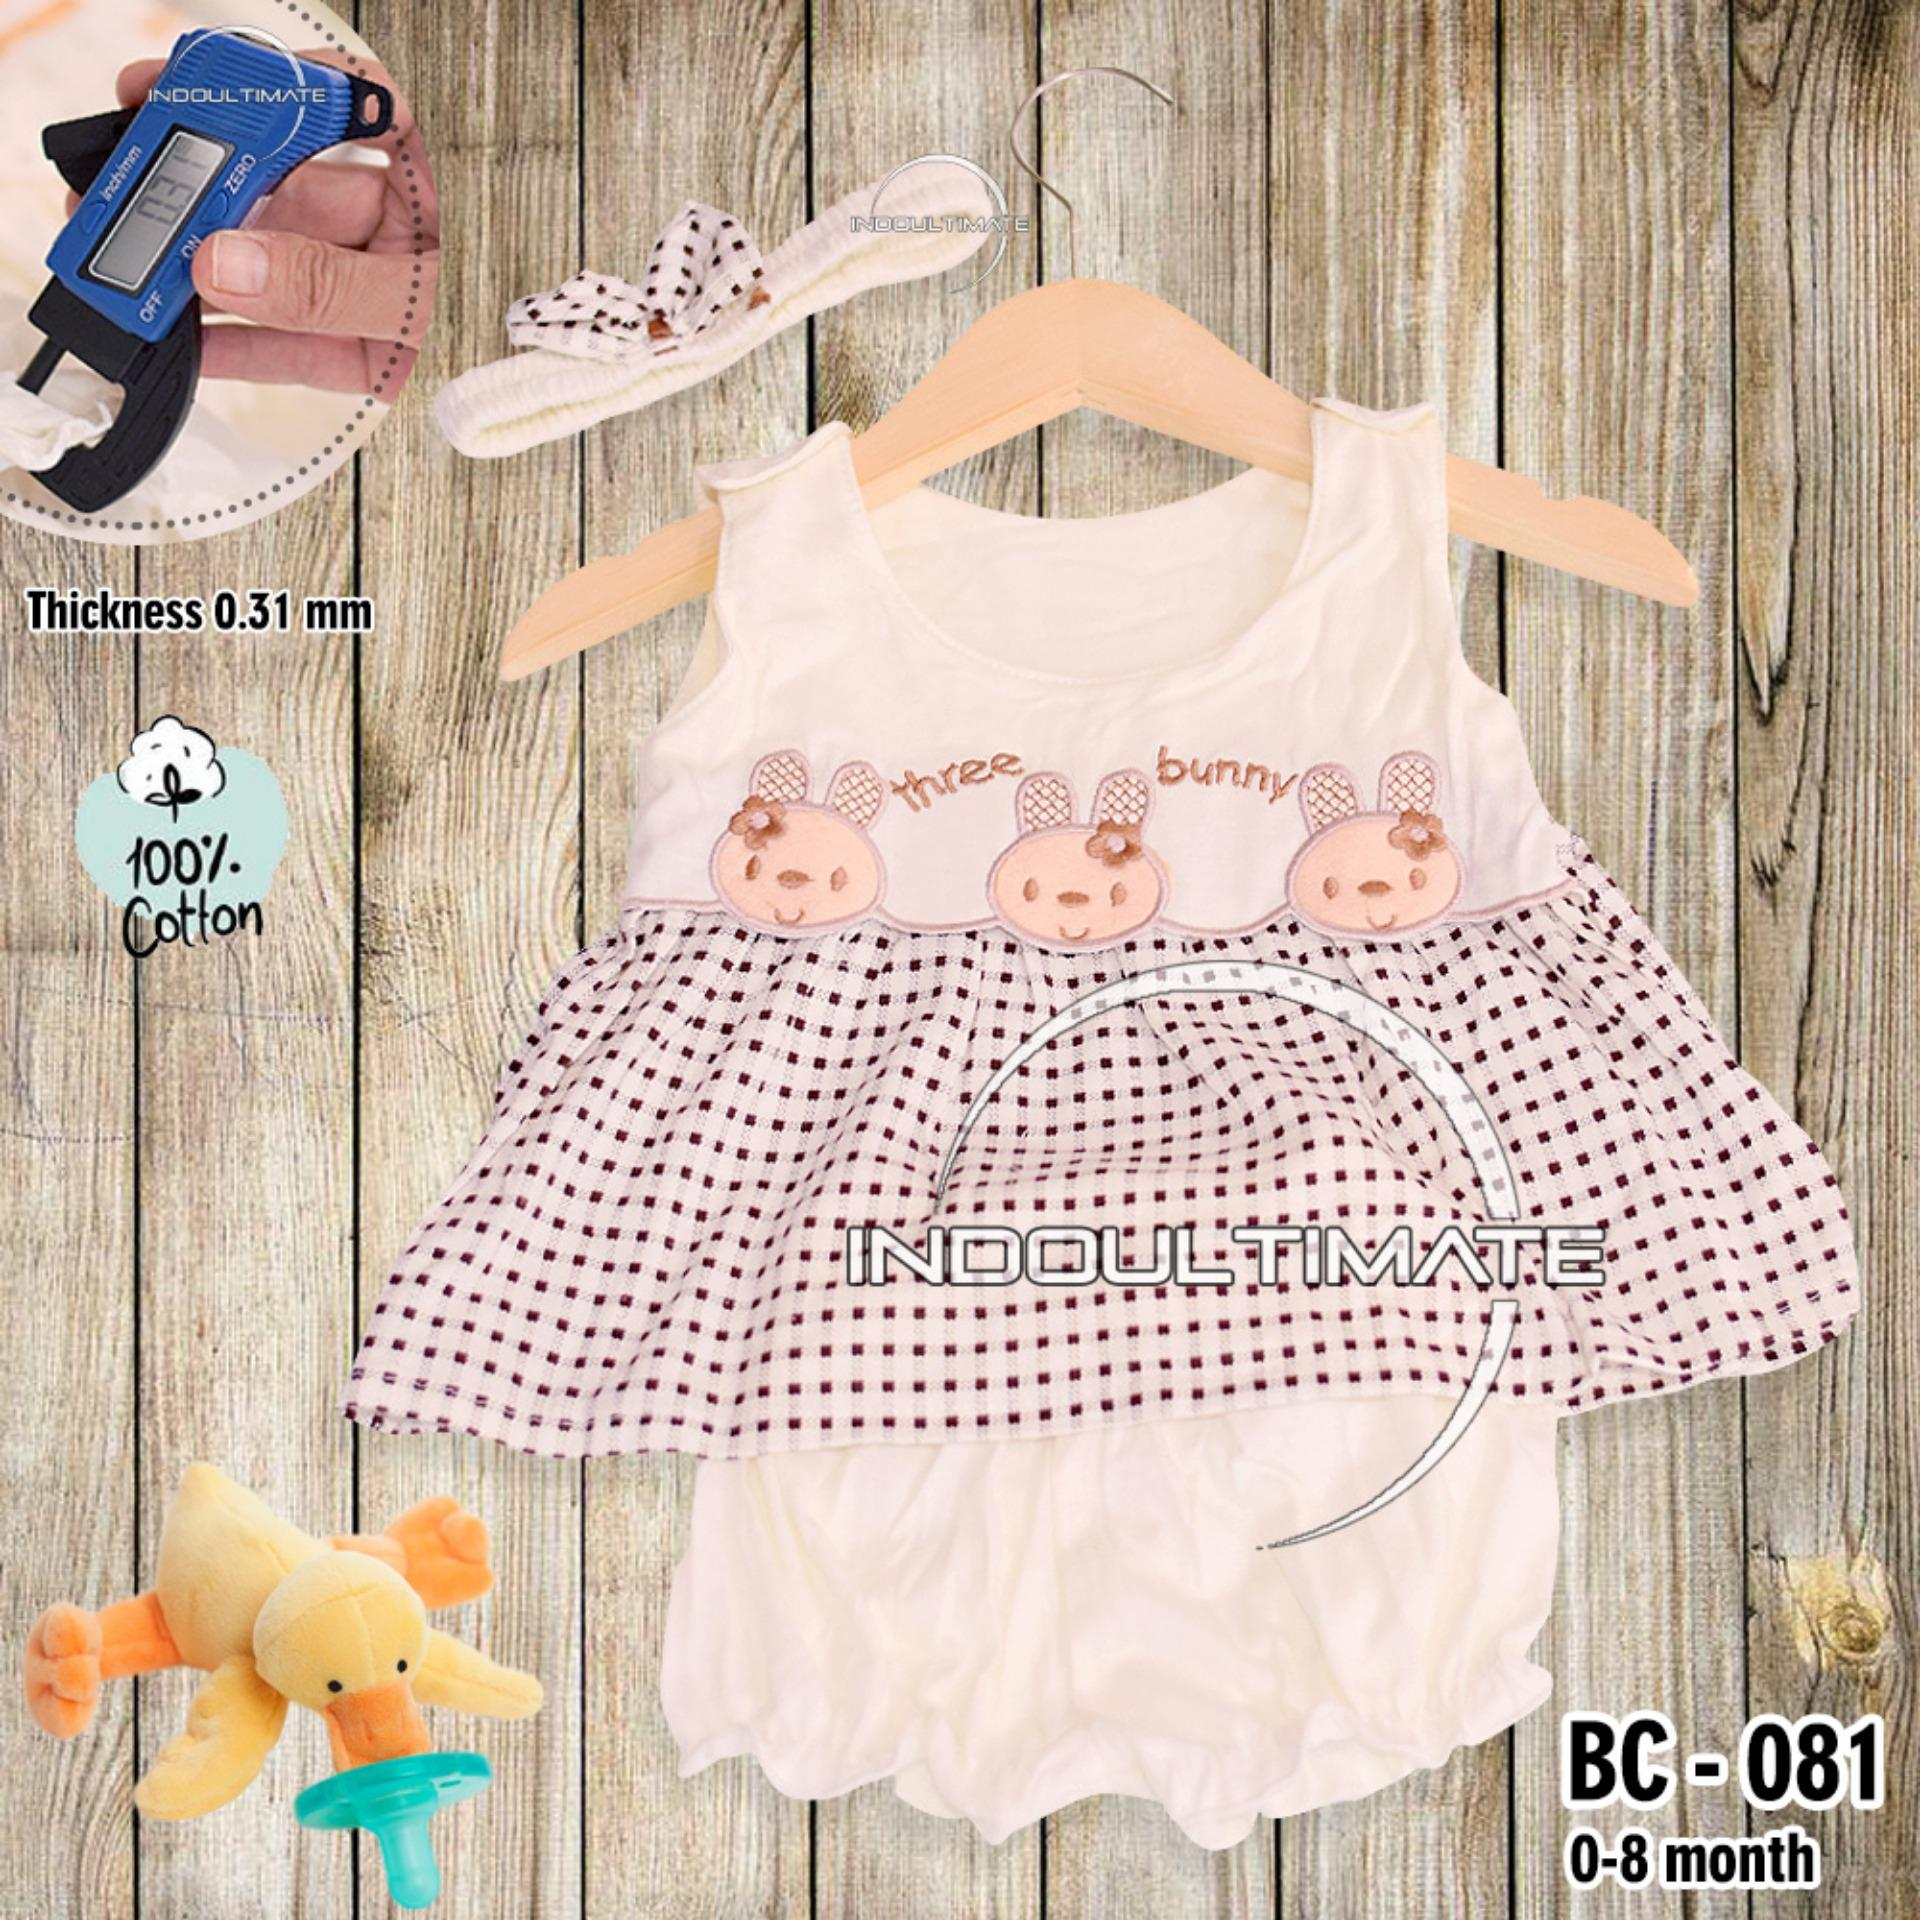 Setelan Baju Baby Cewek / Pakaian Anak Bayi Cewek / Perempuan BY BC-081 BAJU BABY CEWEK SATU SET ATASAN + CELANA + BANDO LUCU